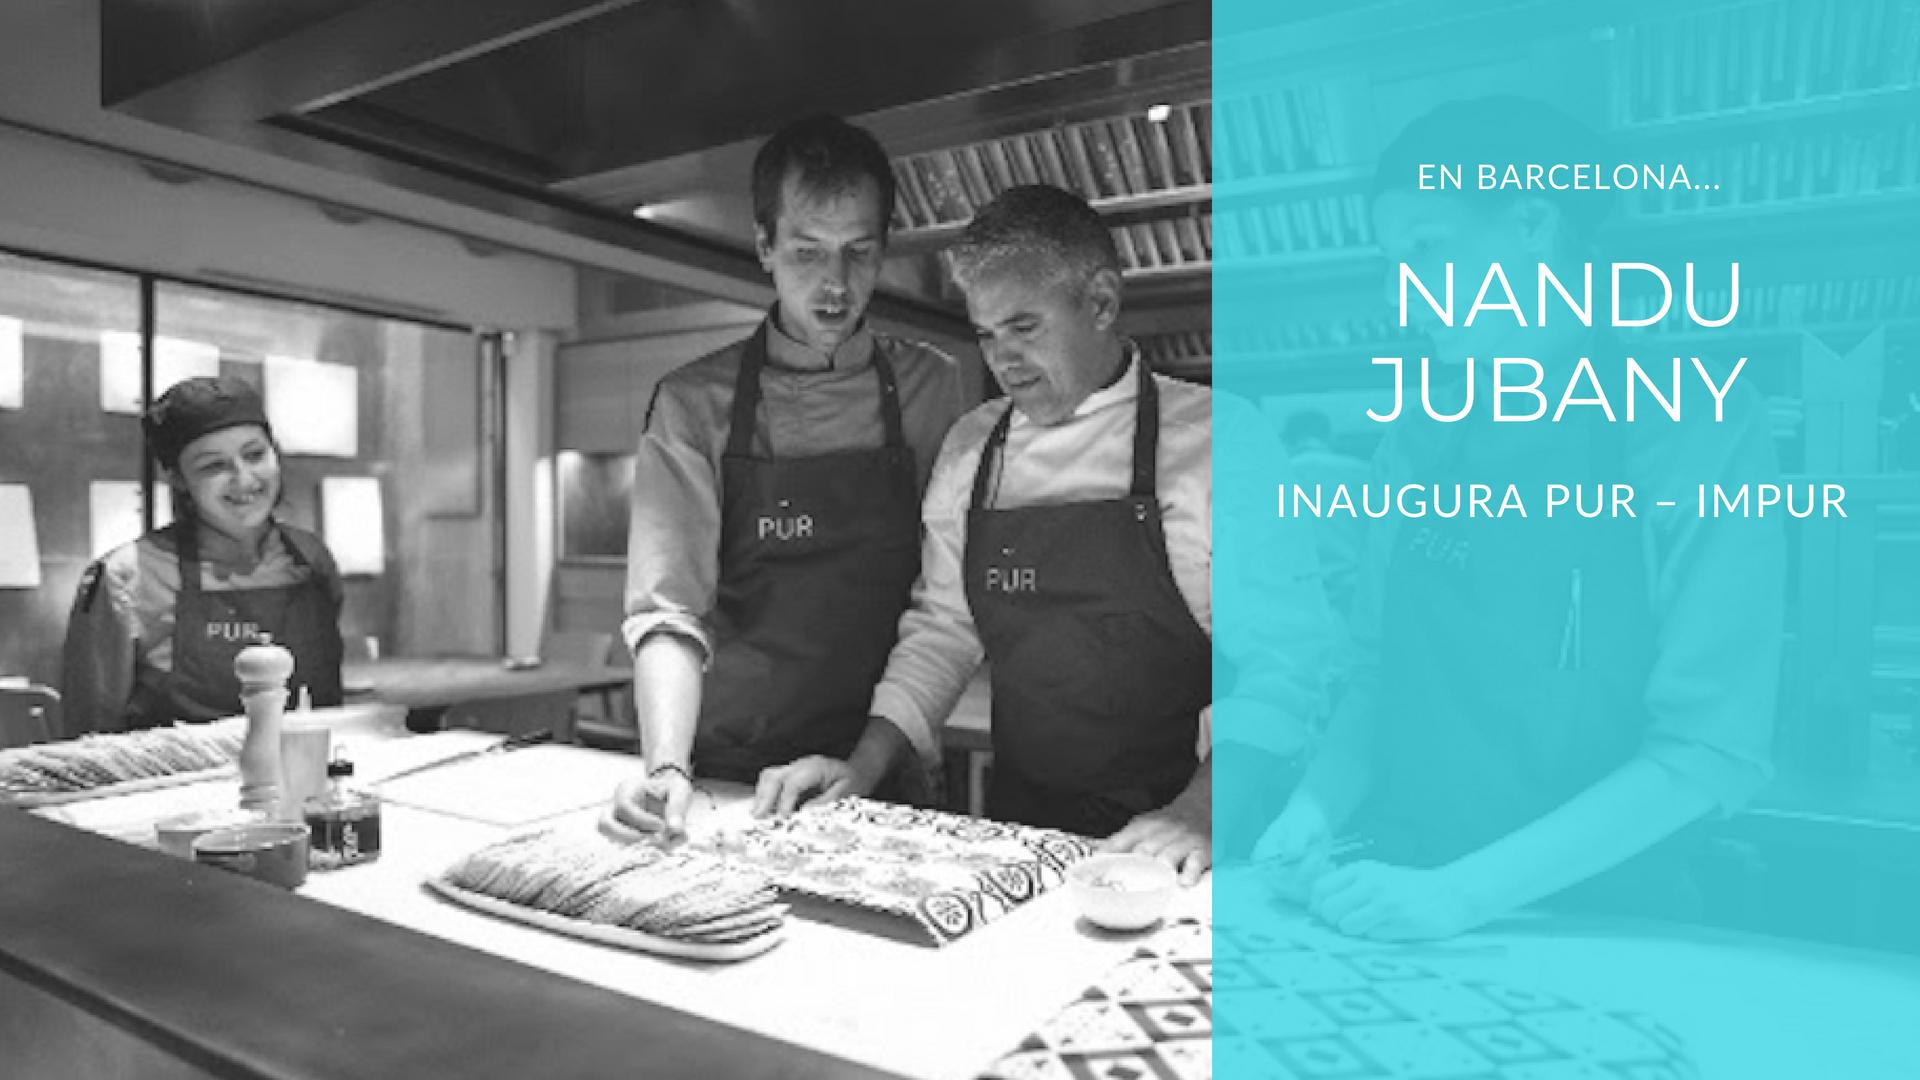 Nandu Jubany inaugura PUR – IMPUR en Barcelona